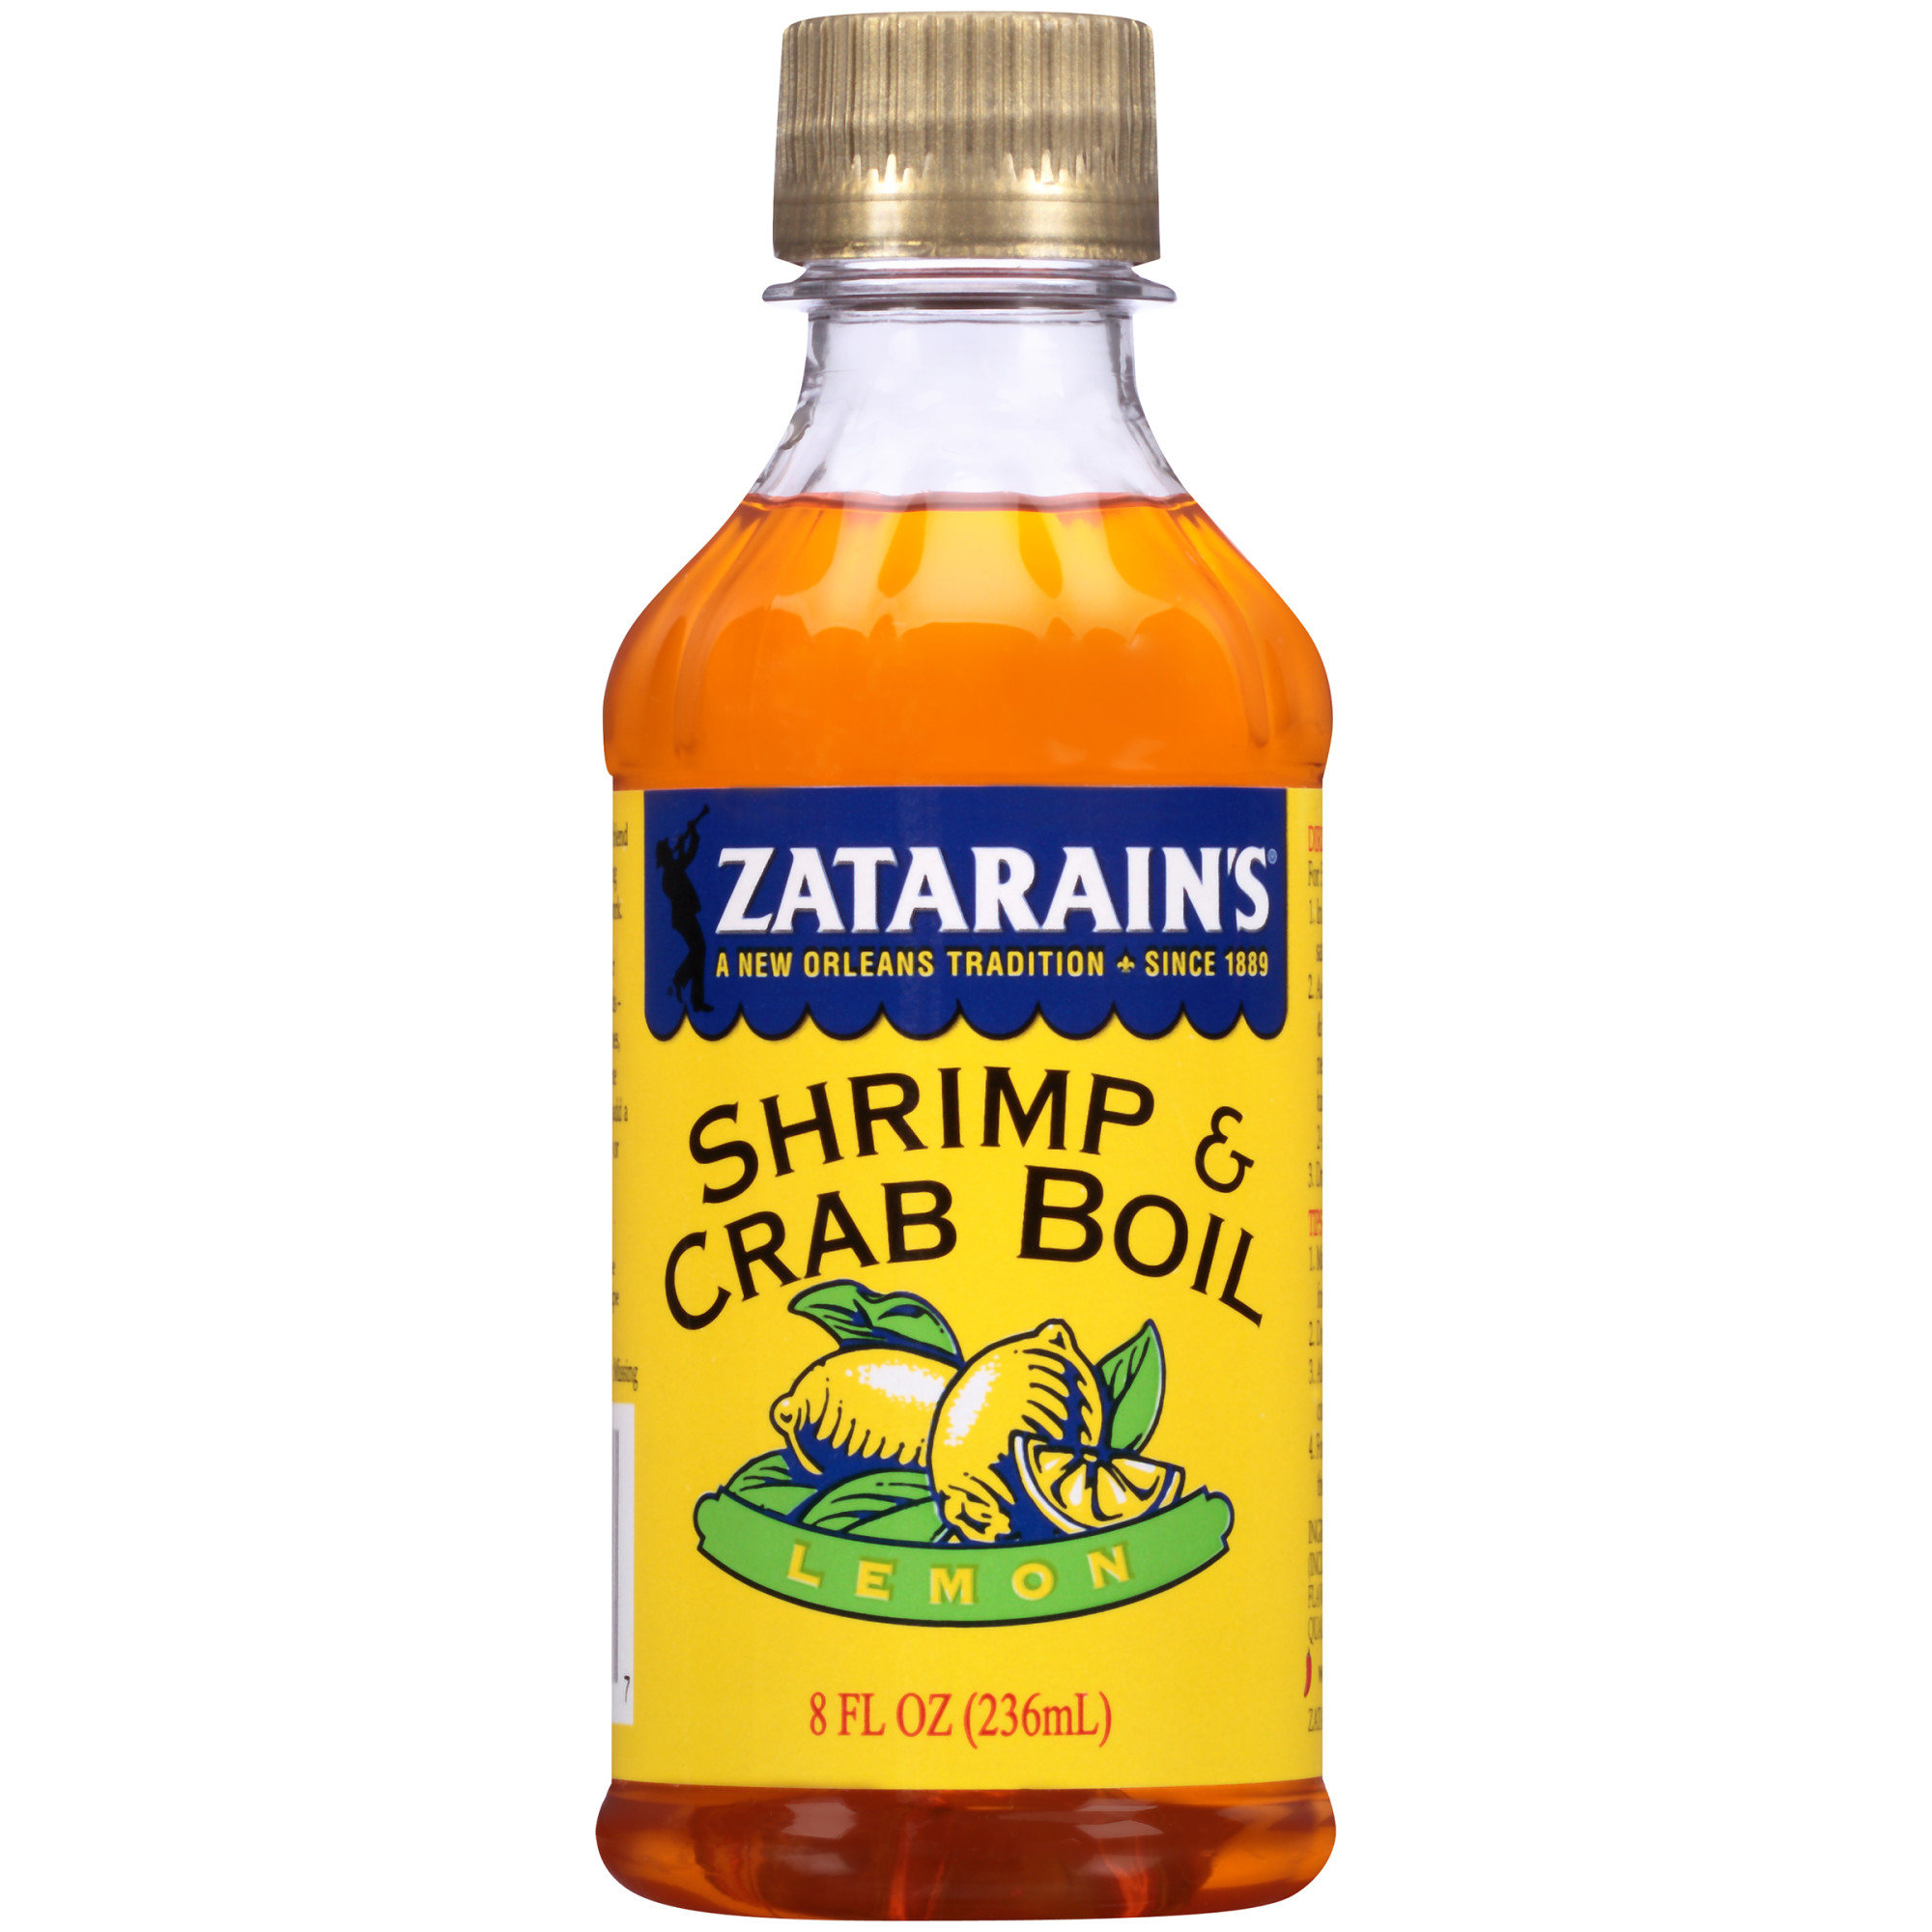 Zatarain's New Orleans Style Liquid Crab Boil With Lemon, 8 oz